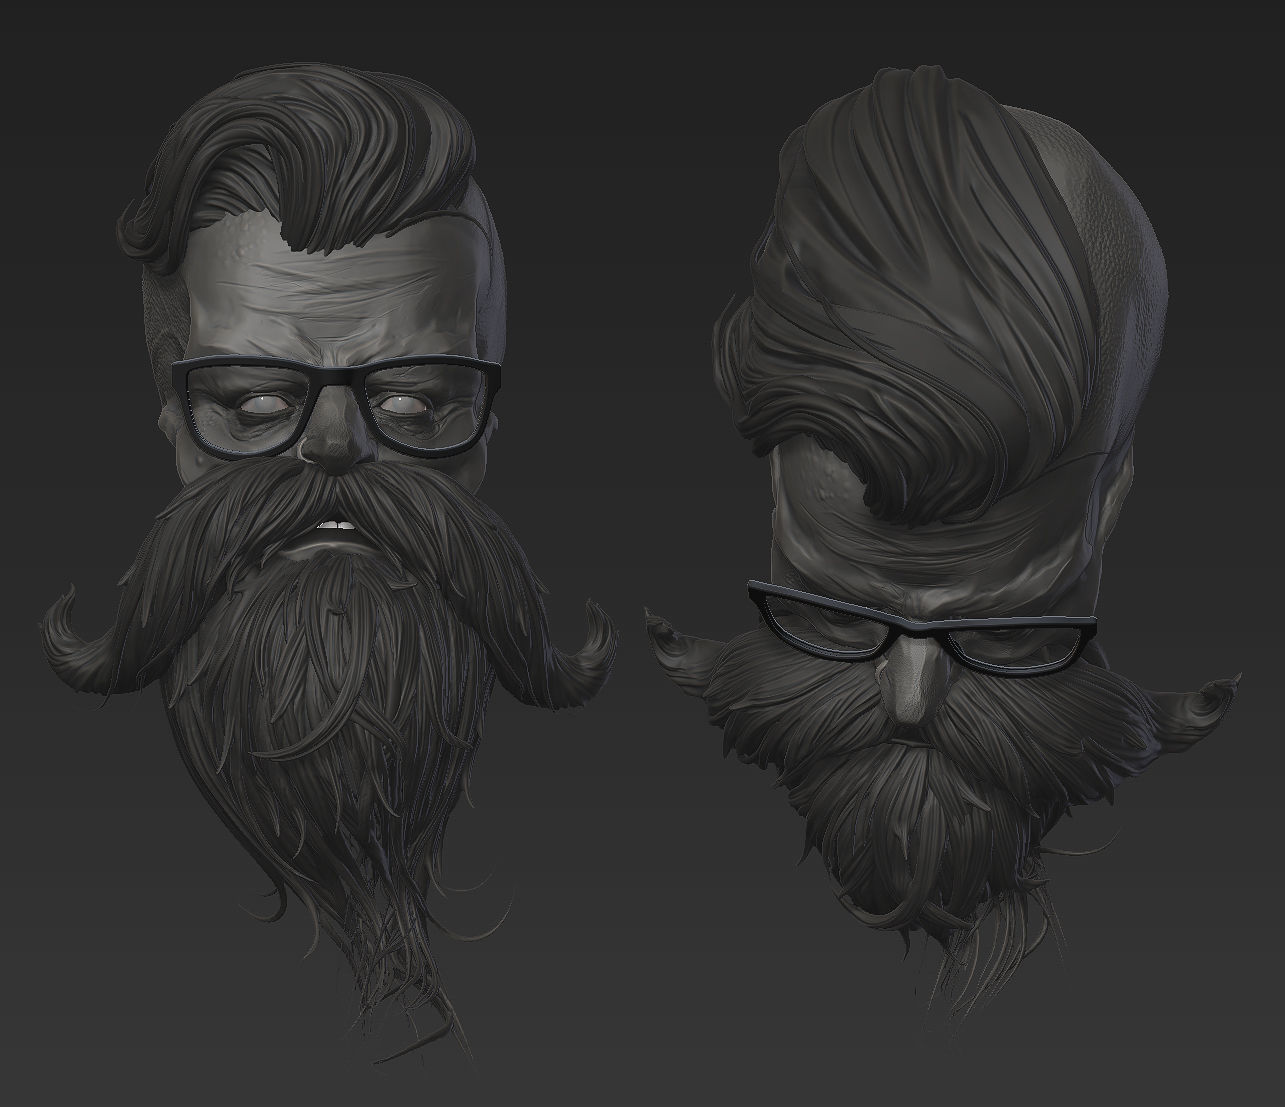 Dead Hipster